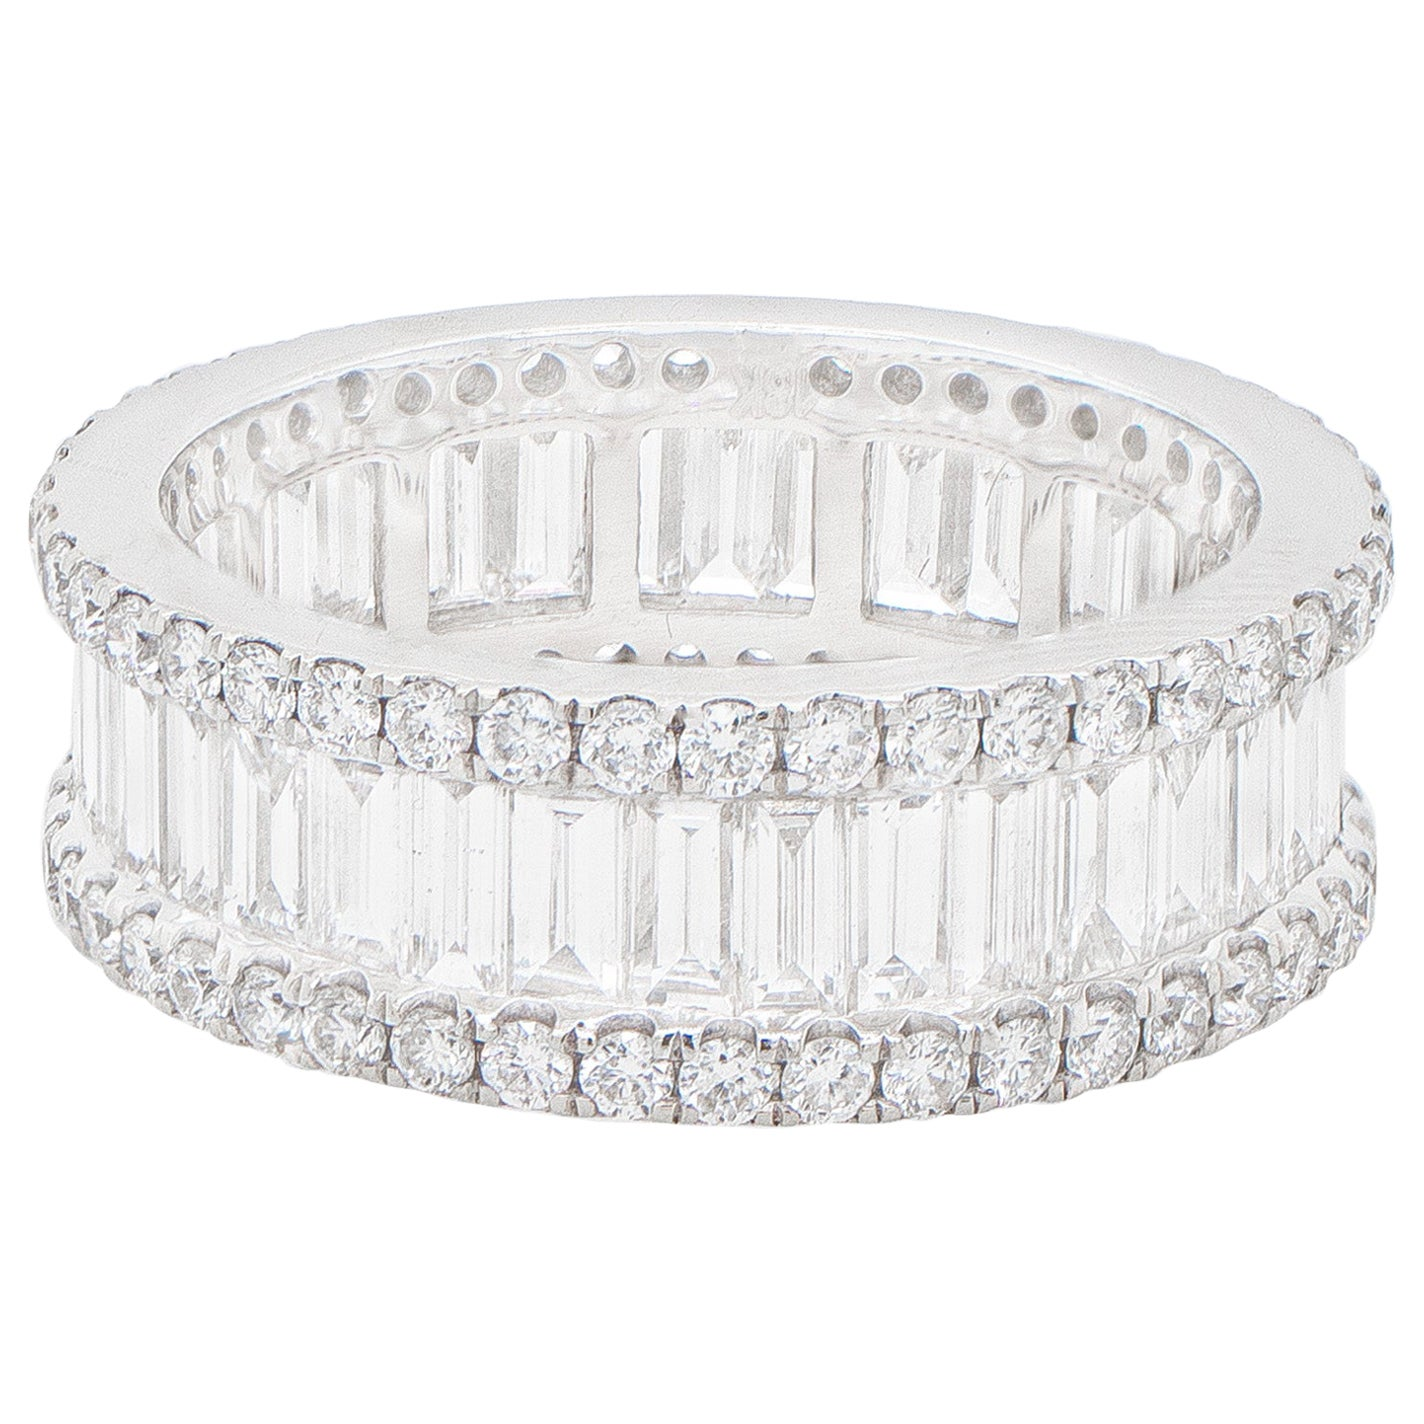 Diamond Eternity Band Ring 3.55 Carats 18K White Gold